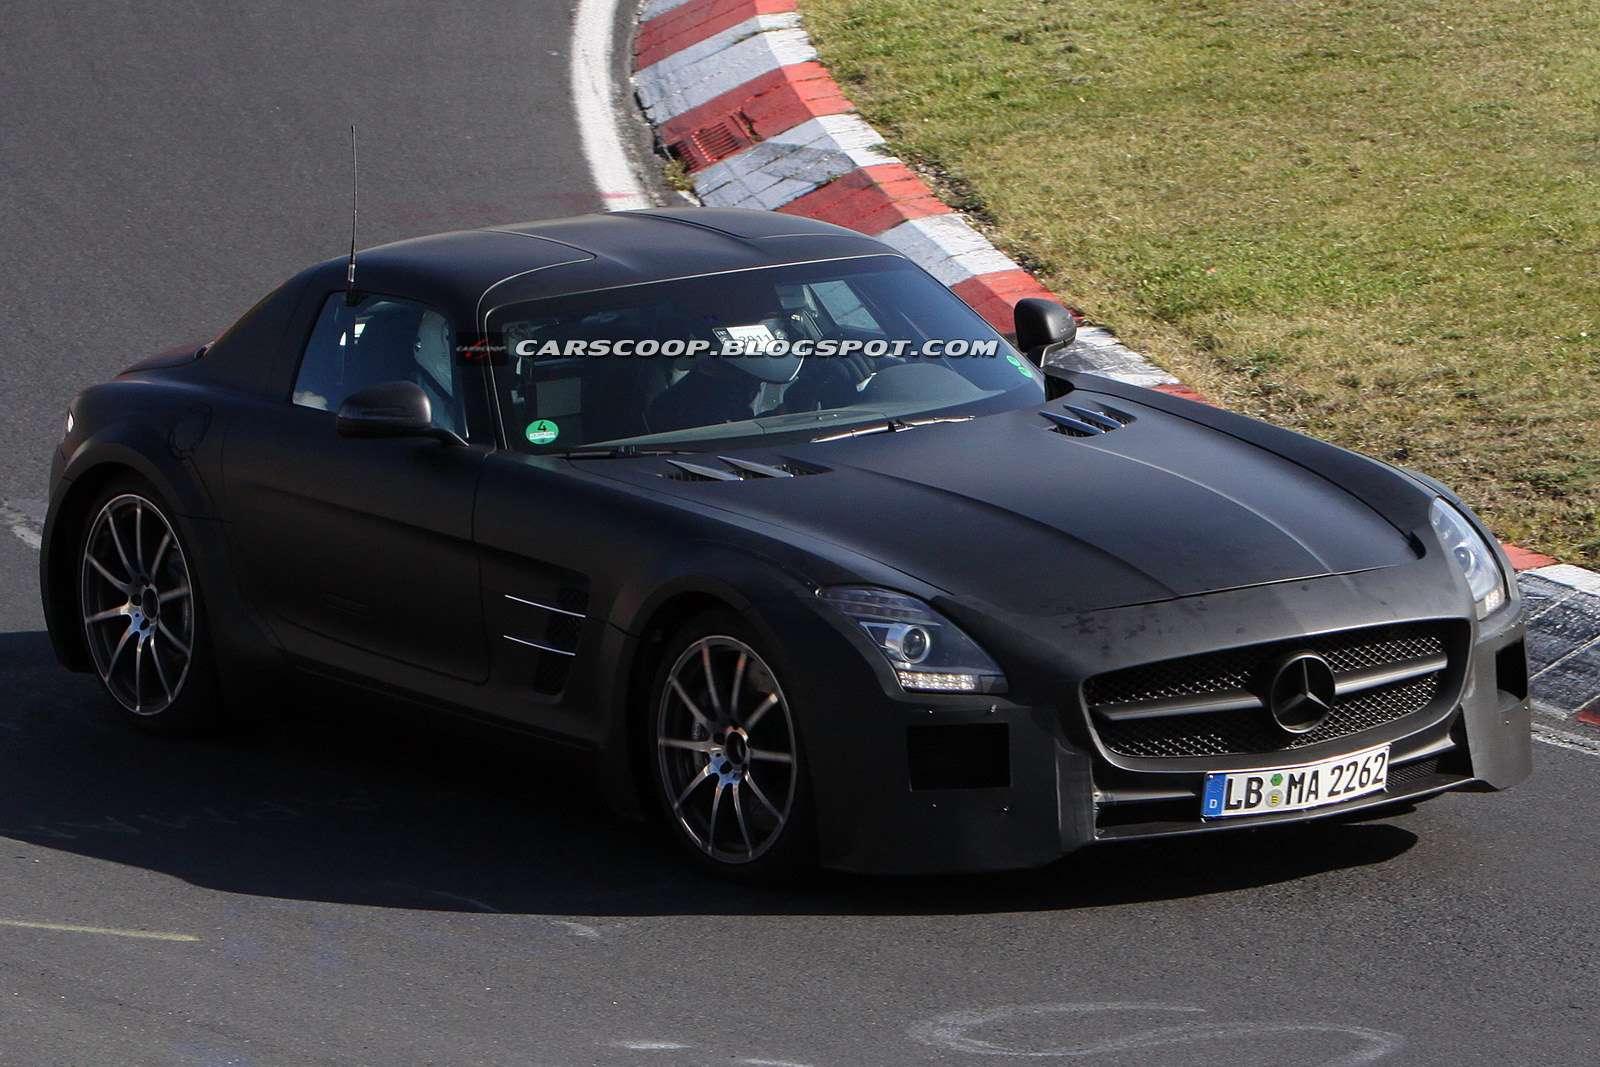 Mercedes-Benz SLS AMG Black Series szpieg fot pazdziernik 2011